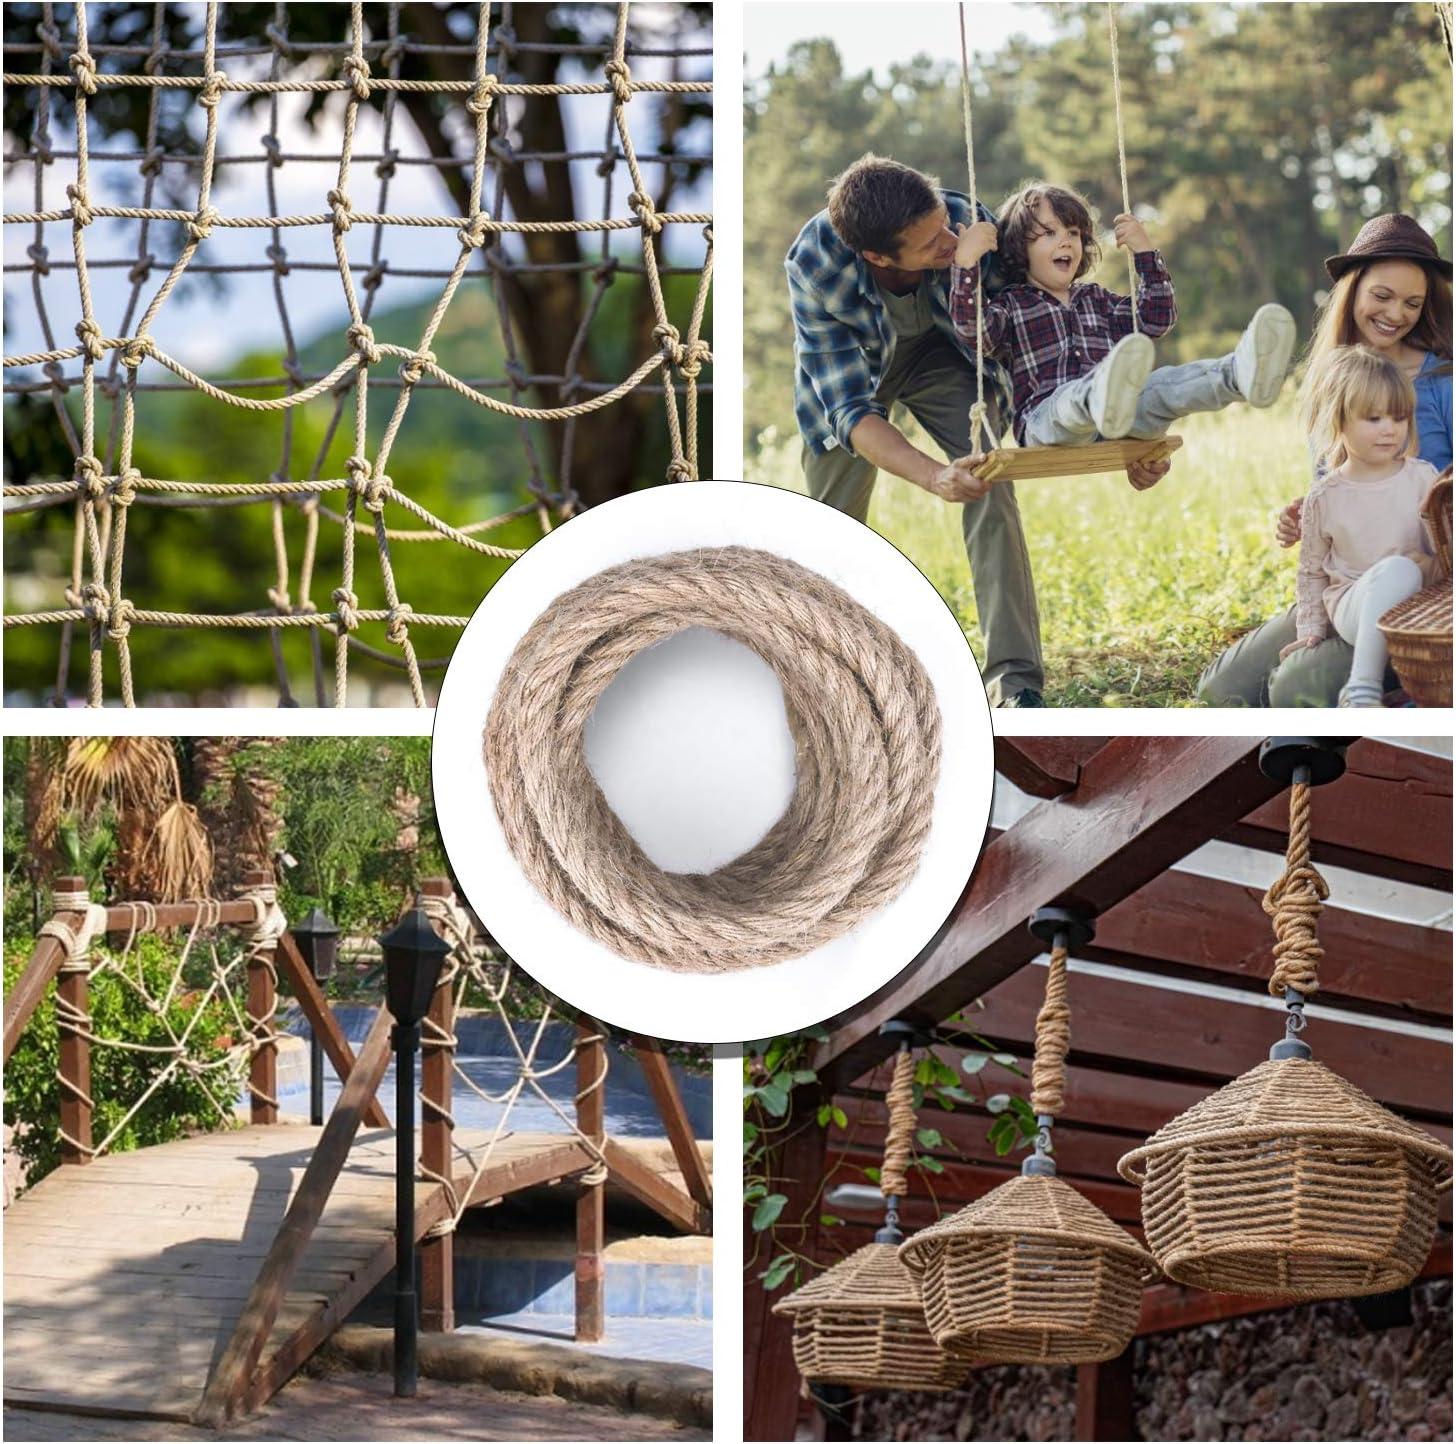 Natural Jute Twine Hemp Rope 12MM Hemp Braided Rope 32 Feet Craft Rope for DIY /& Arts Industrial Packing Materials Gardening Applications 12mm